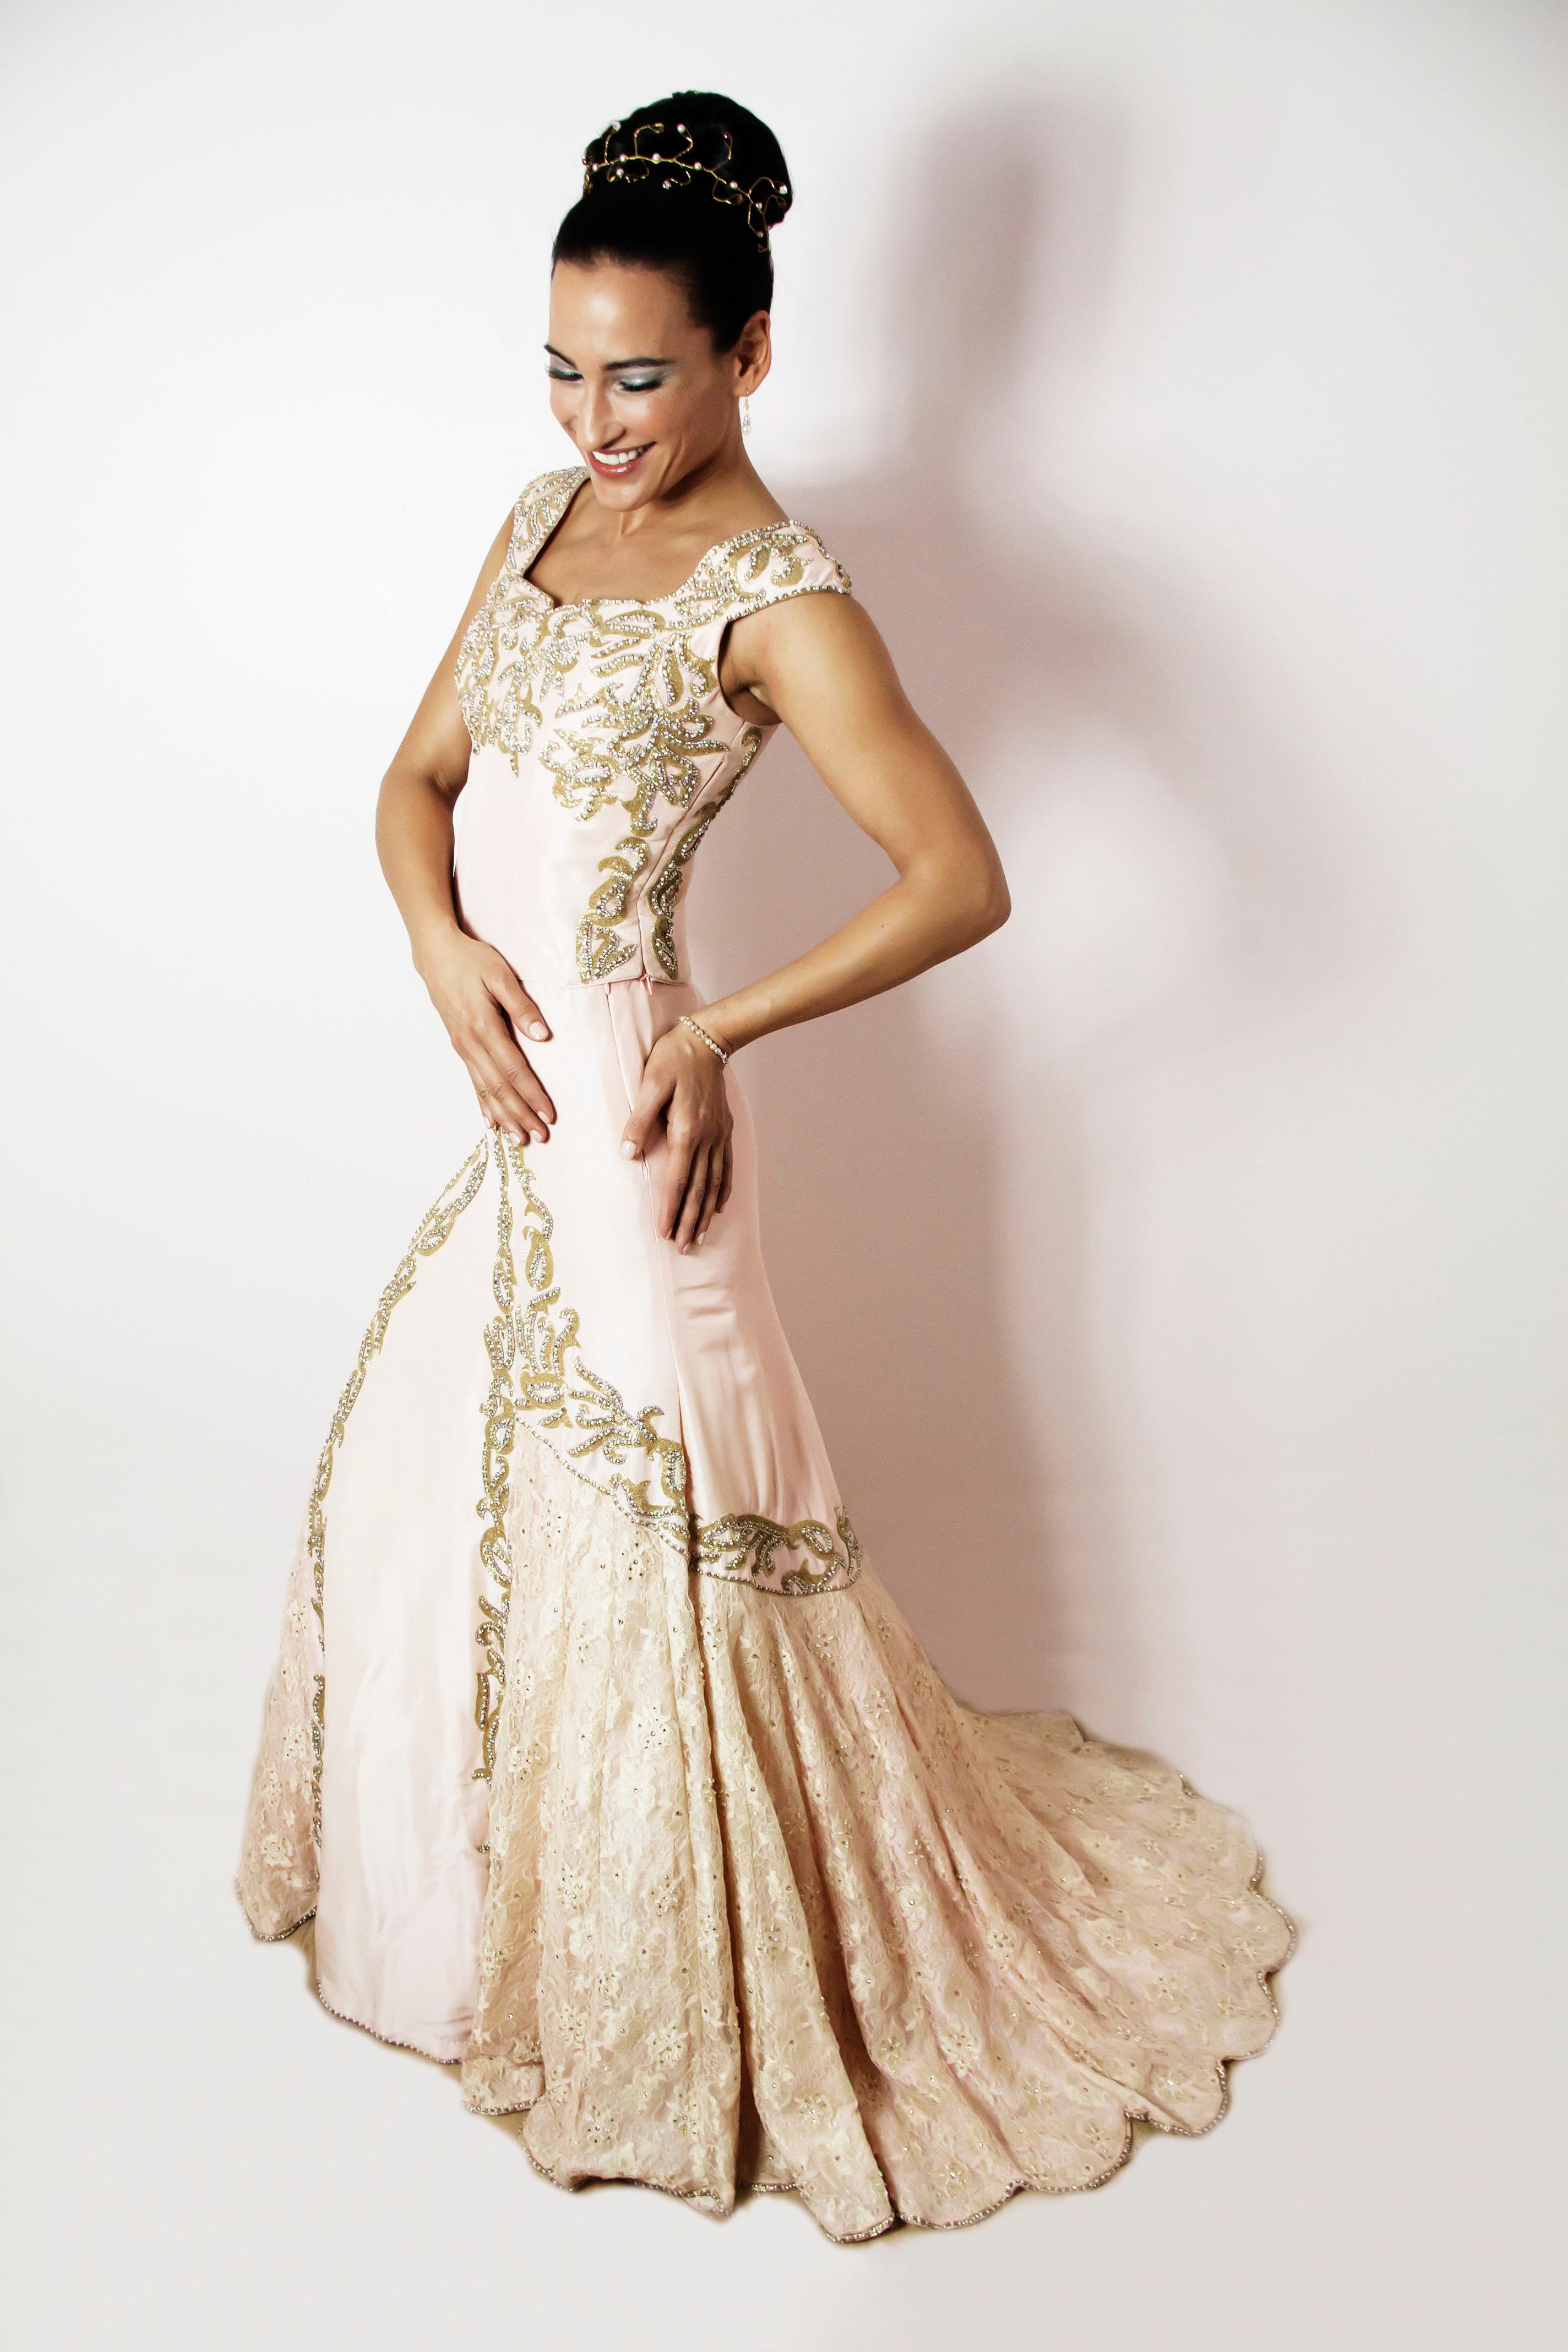 dress11_MG_4170